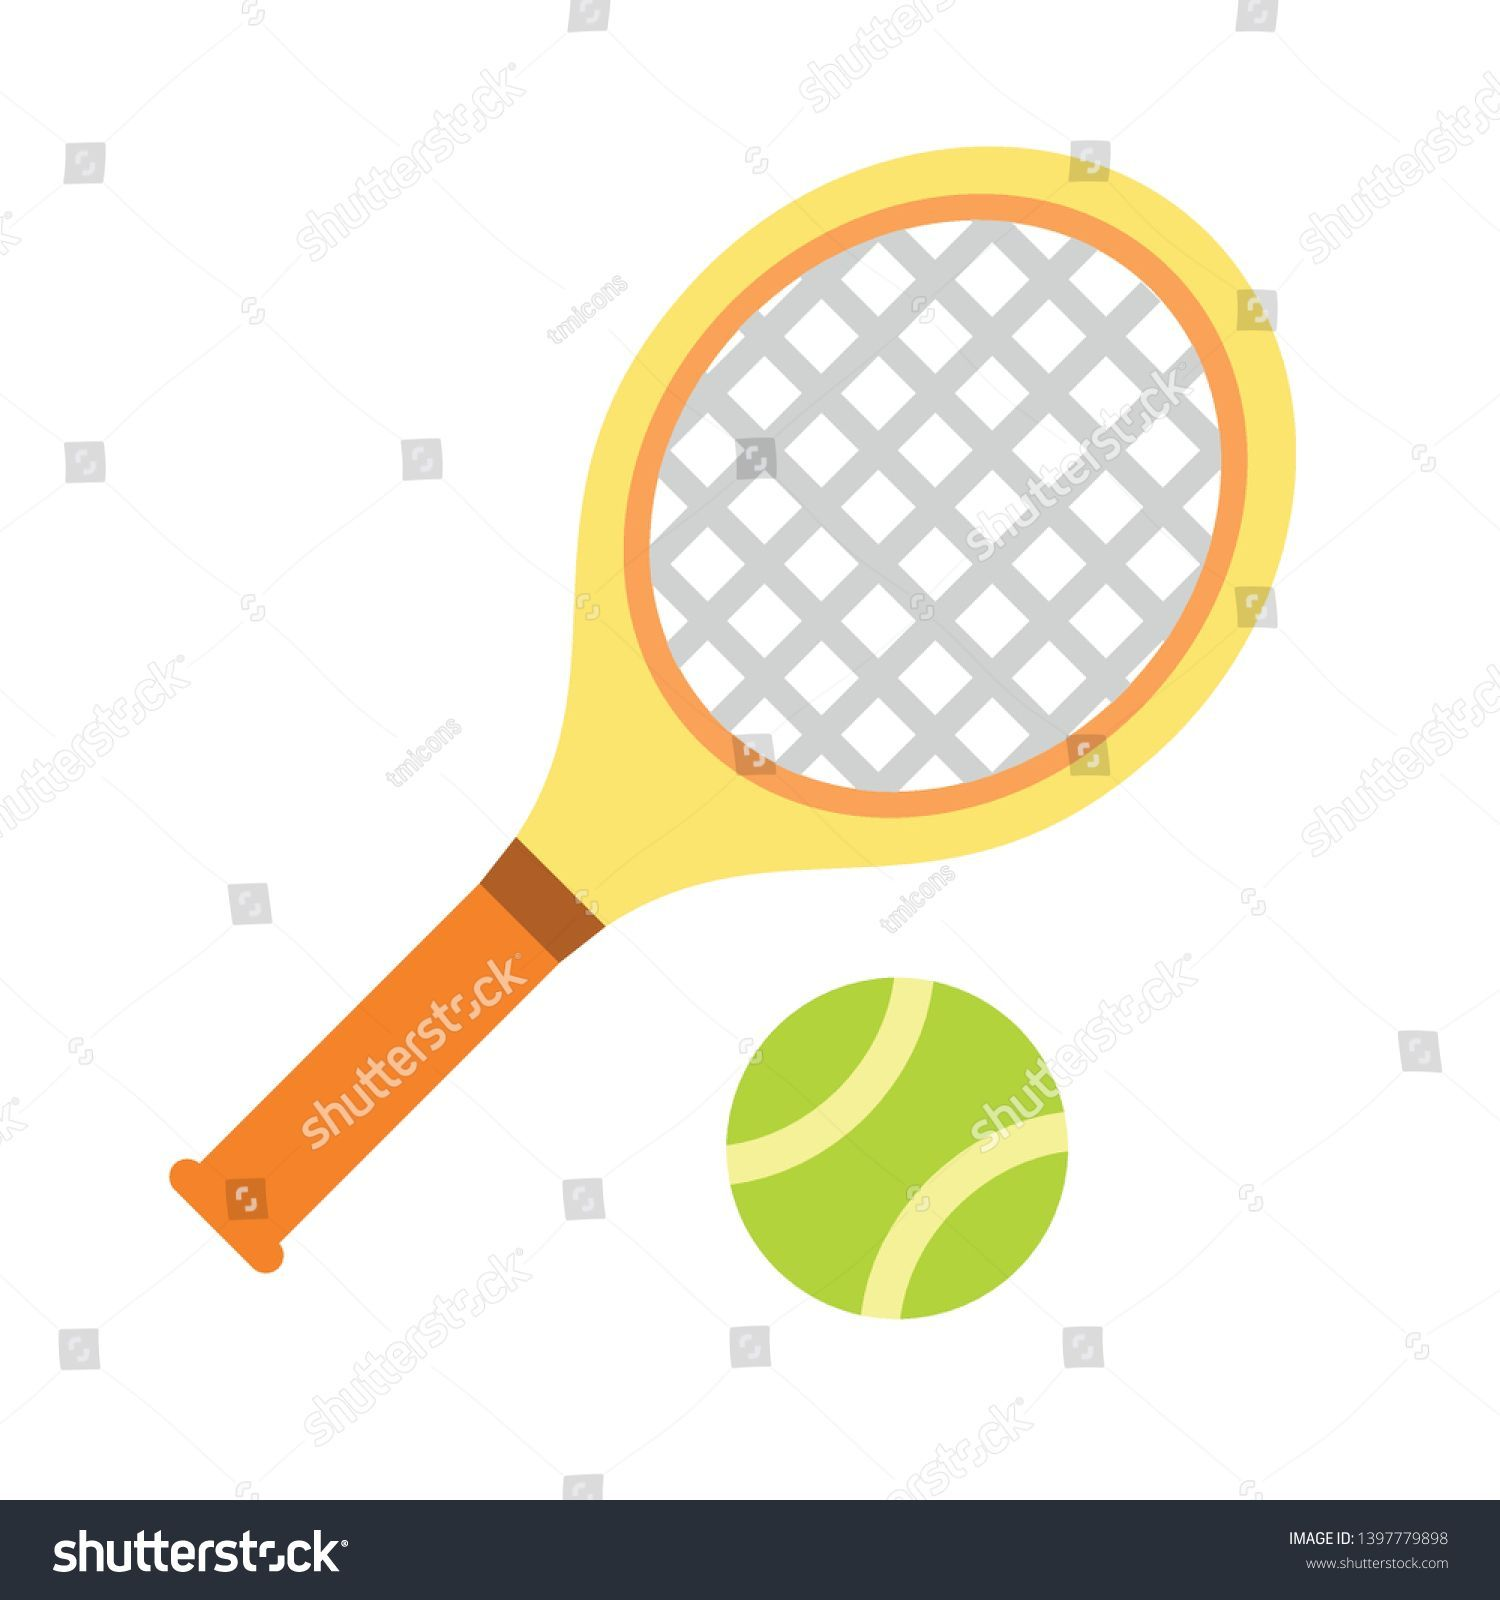 Tennis Racket With Ball Sign Icon Sport Laurel Wreath Symbol Winner Award Abs Abs Award Ball Icon Laurel L Tennis Racket Rackets Tennis